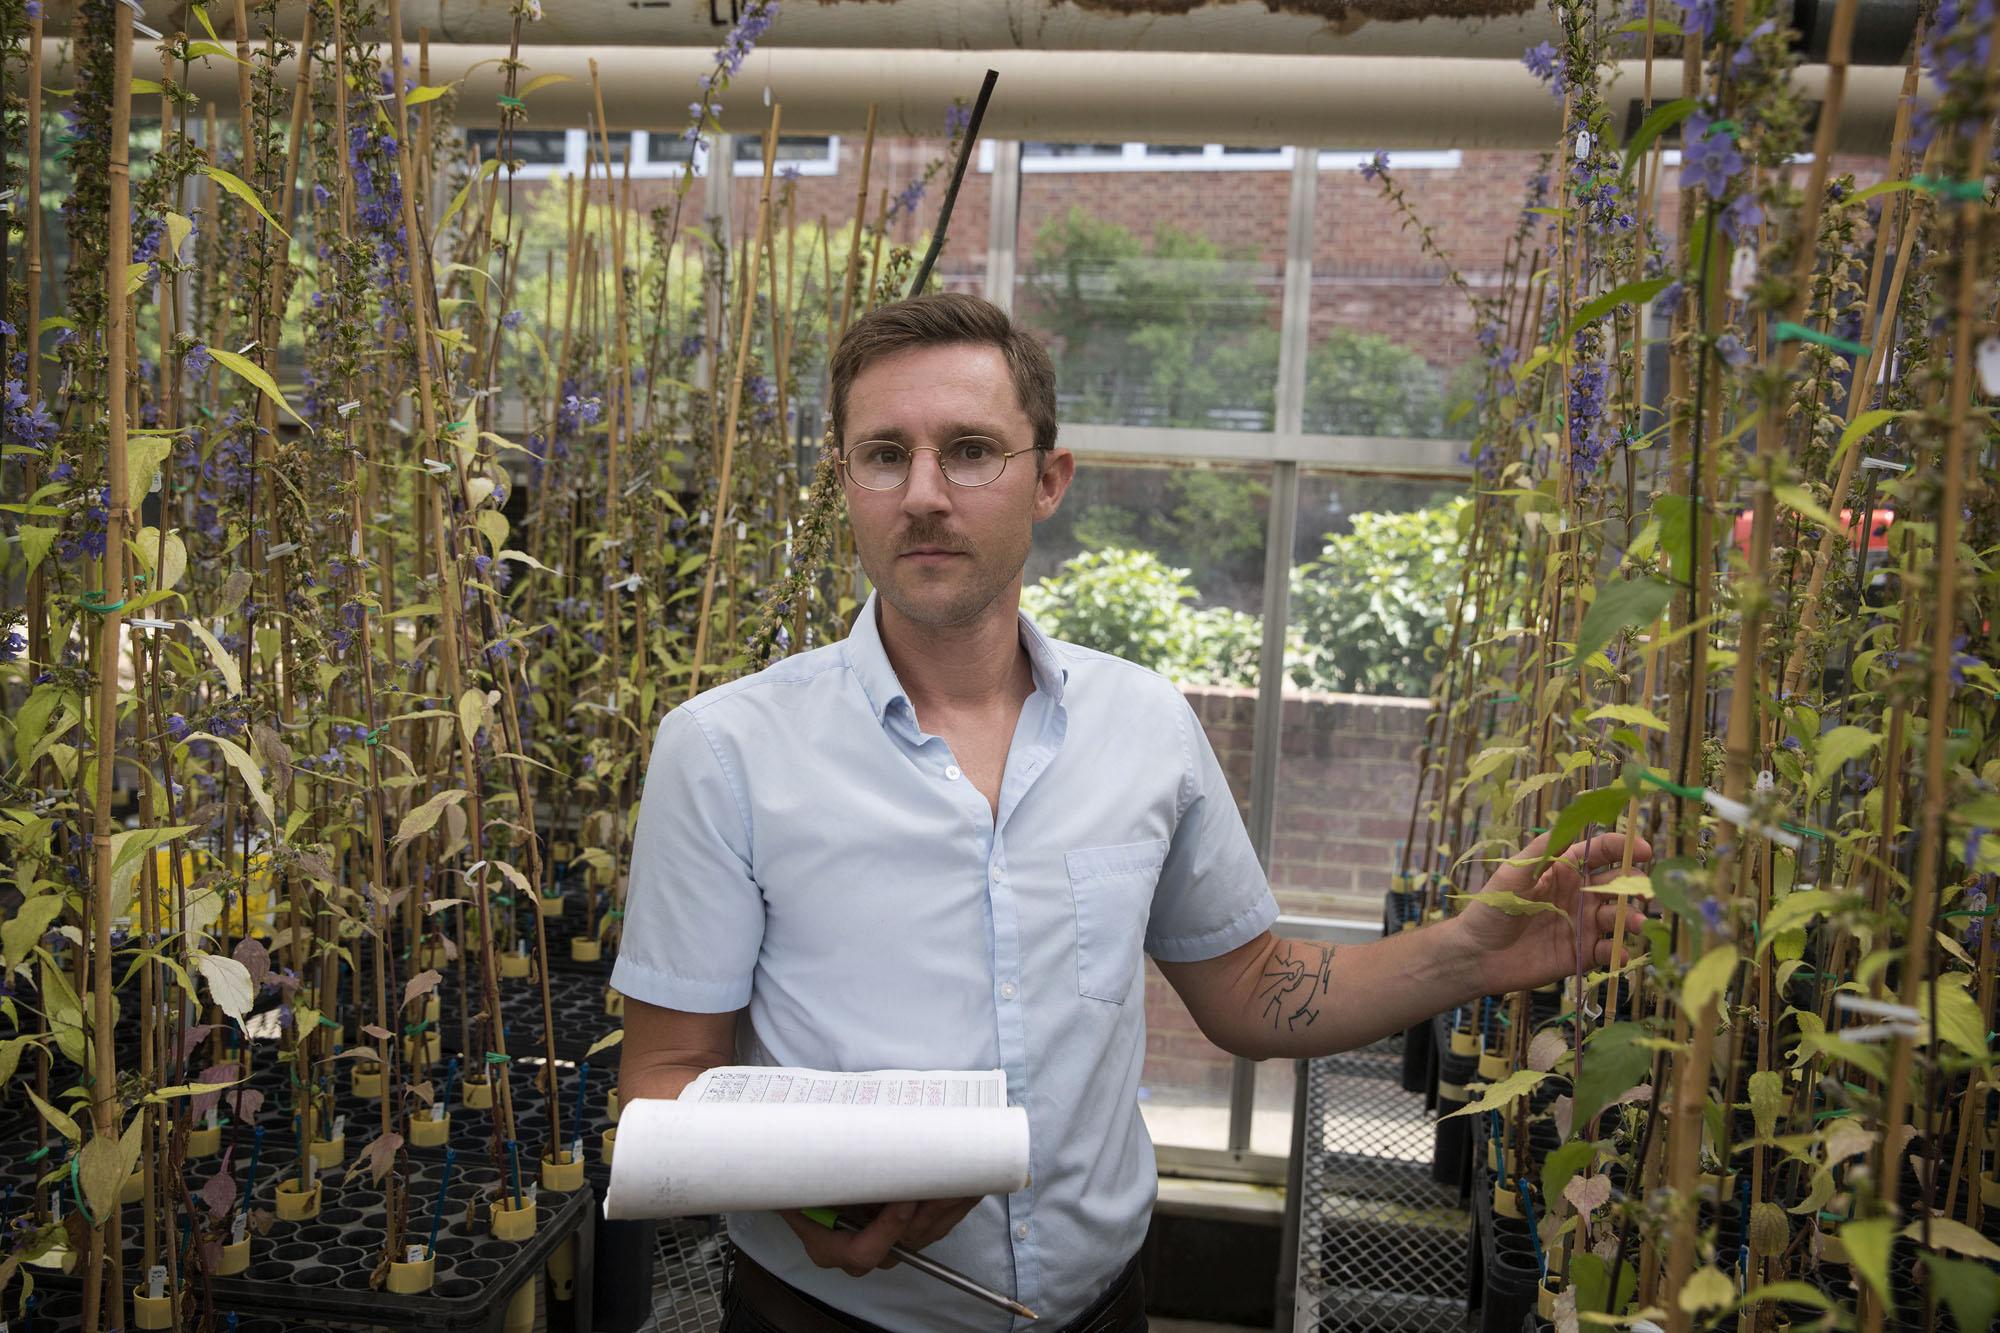 Matt Koski studies the relationships between plants and their pollinators.